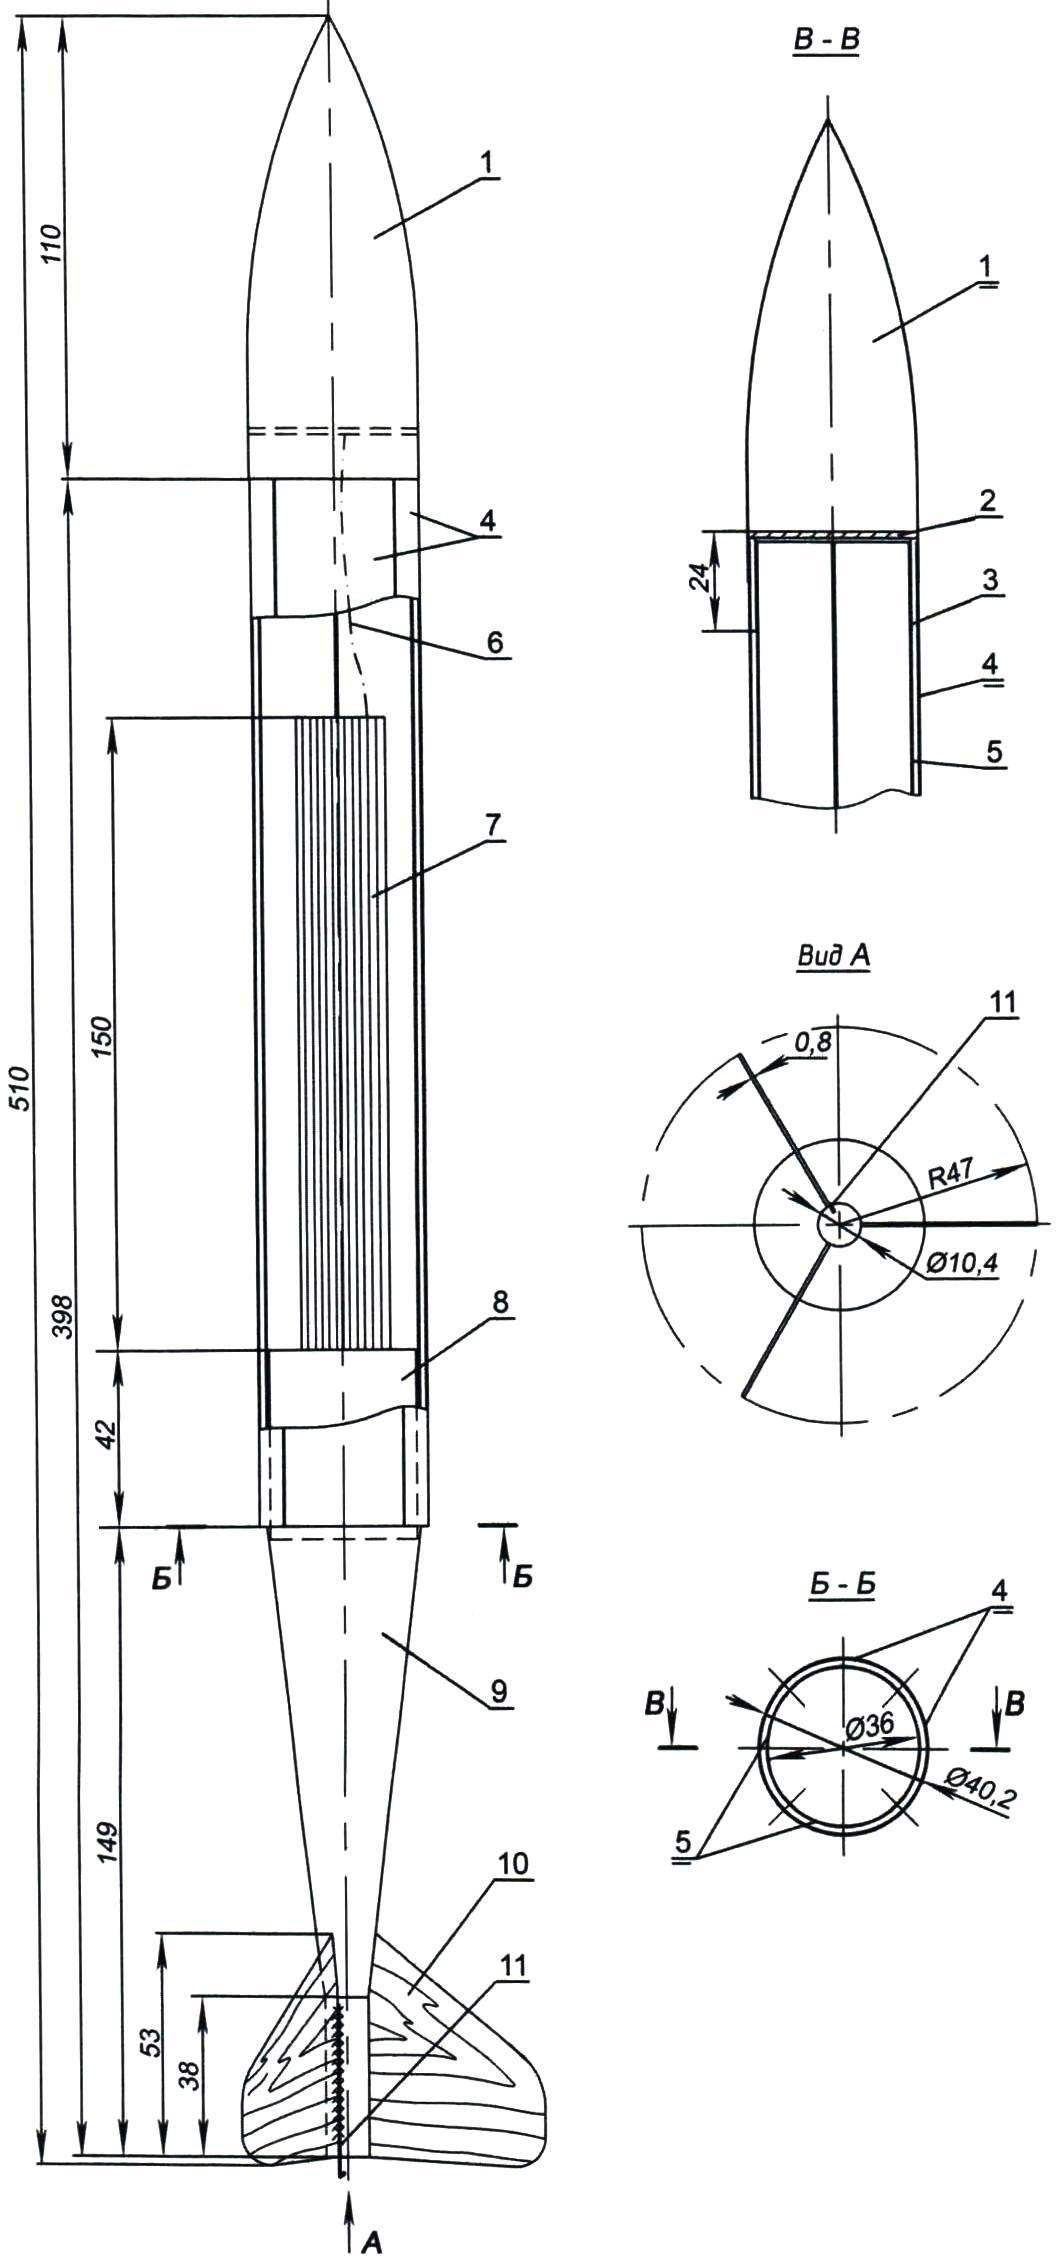 Модель ракеты класса S6А Н. Сергеева